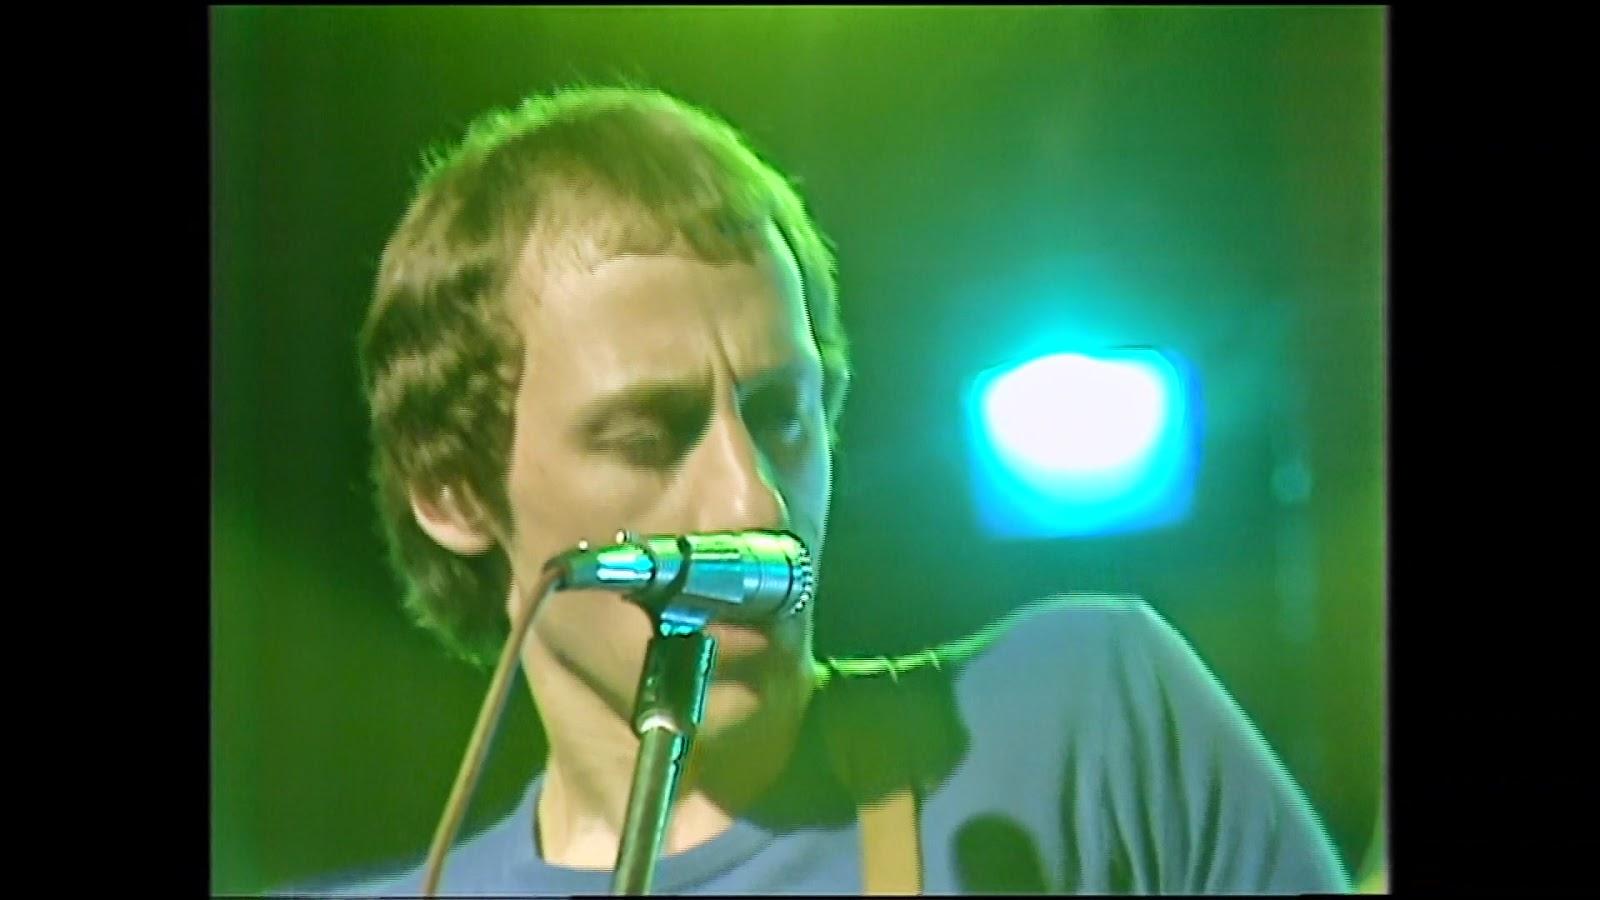 Dire Straits - Alchemy Live (2010) [BD-Rip 1080p]